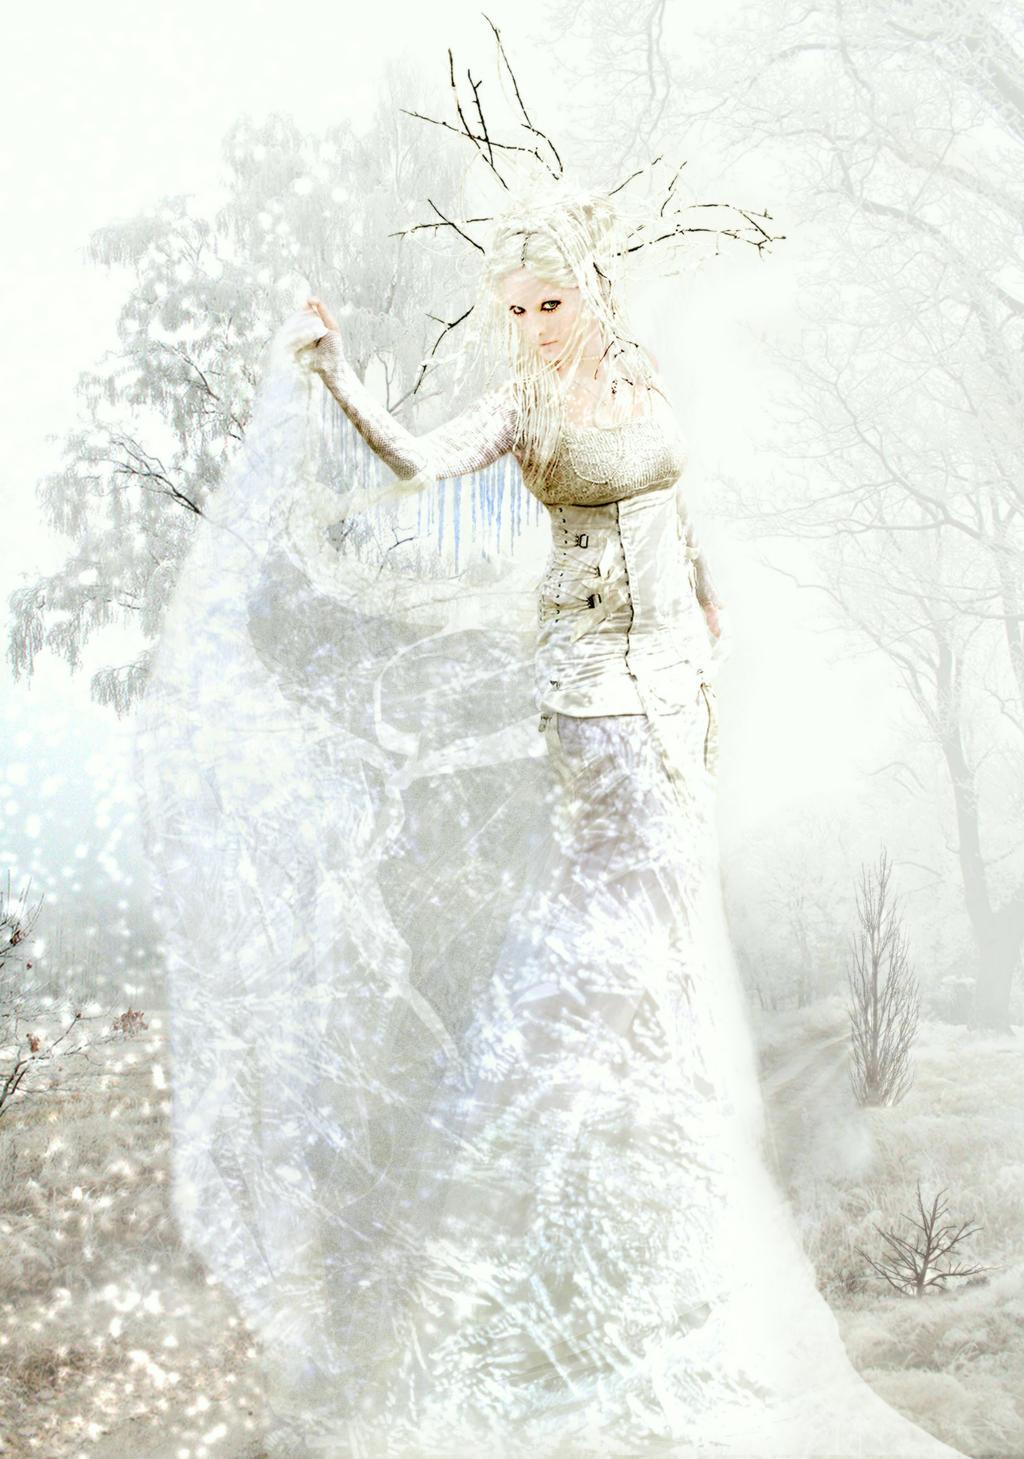 Winter by aninur